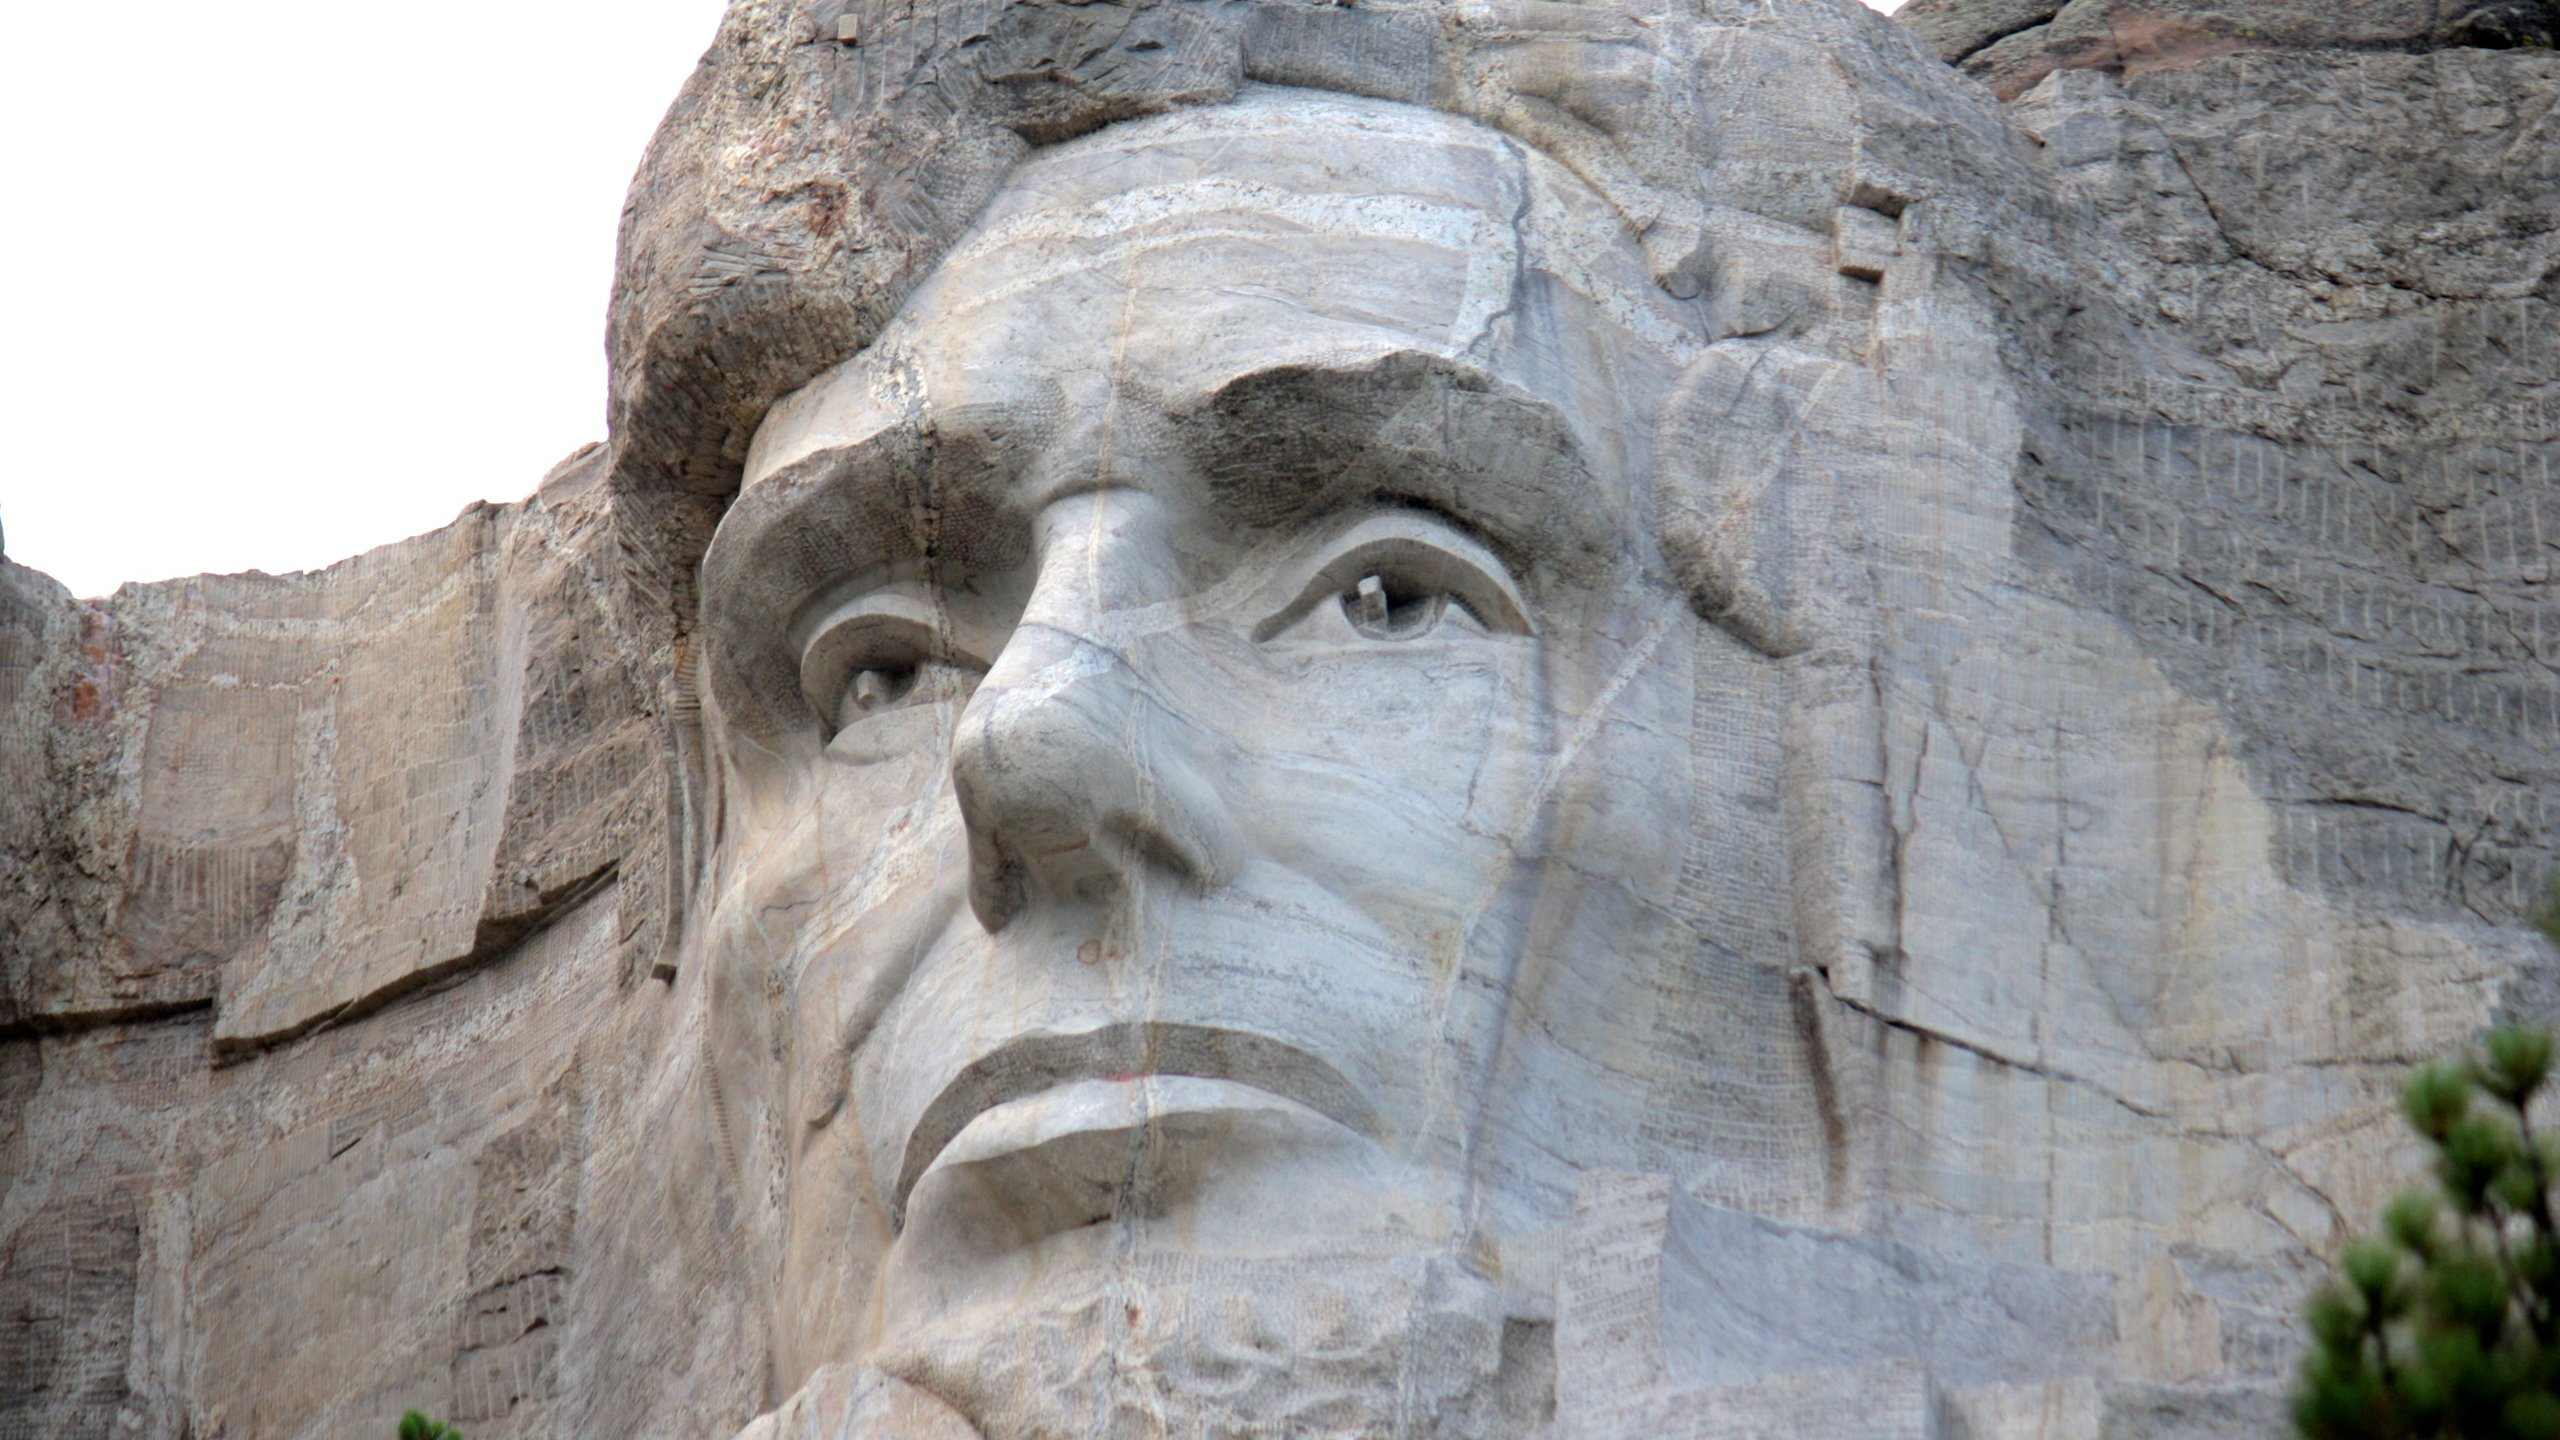 Mount Rushmore National Memorial, Keystone, South Dakota, United States of America